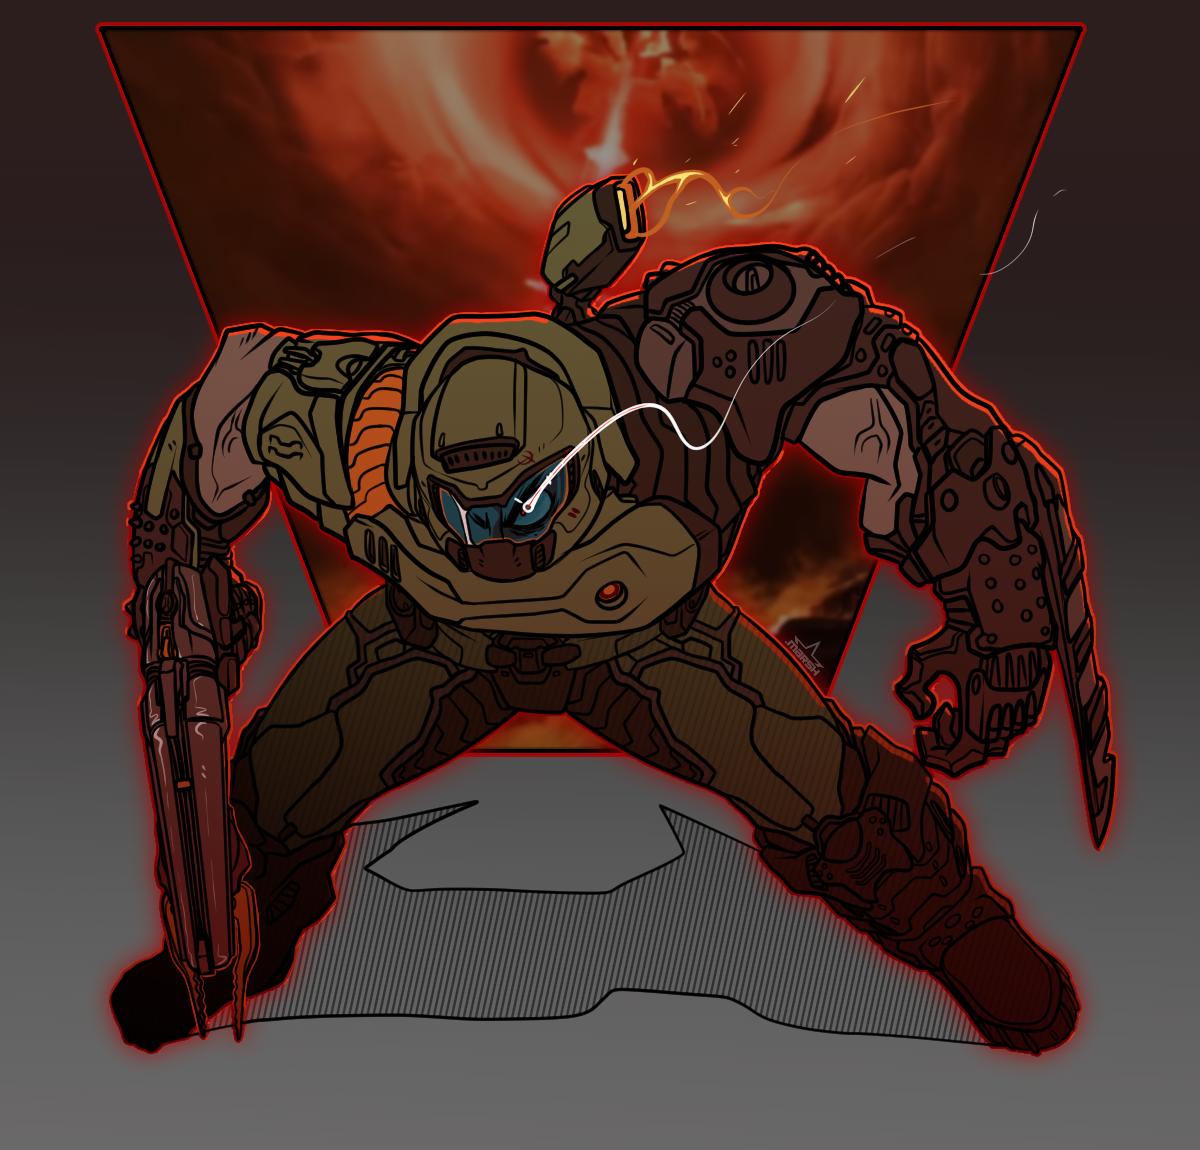 Menacing Marshmallow Eternal Doom Videogame Doom Slayer